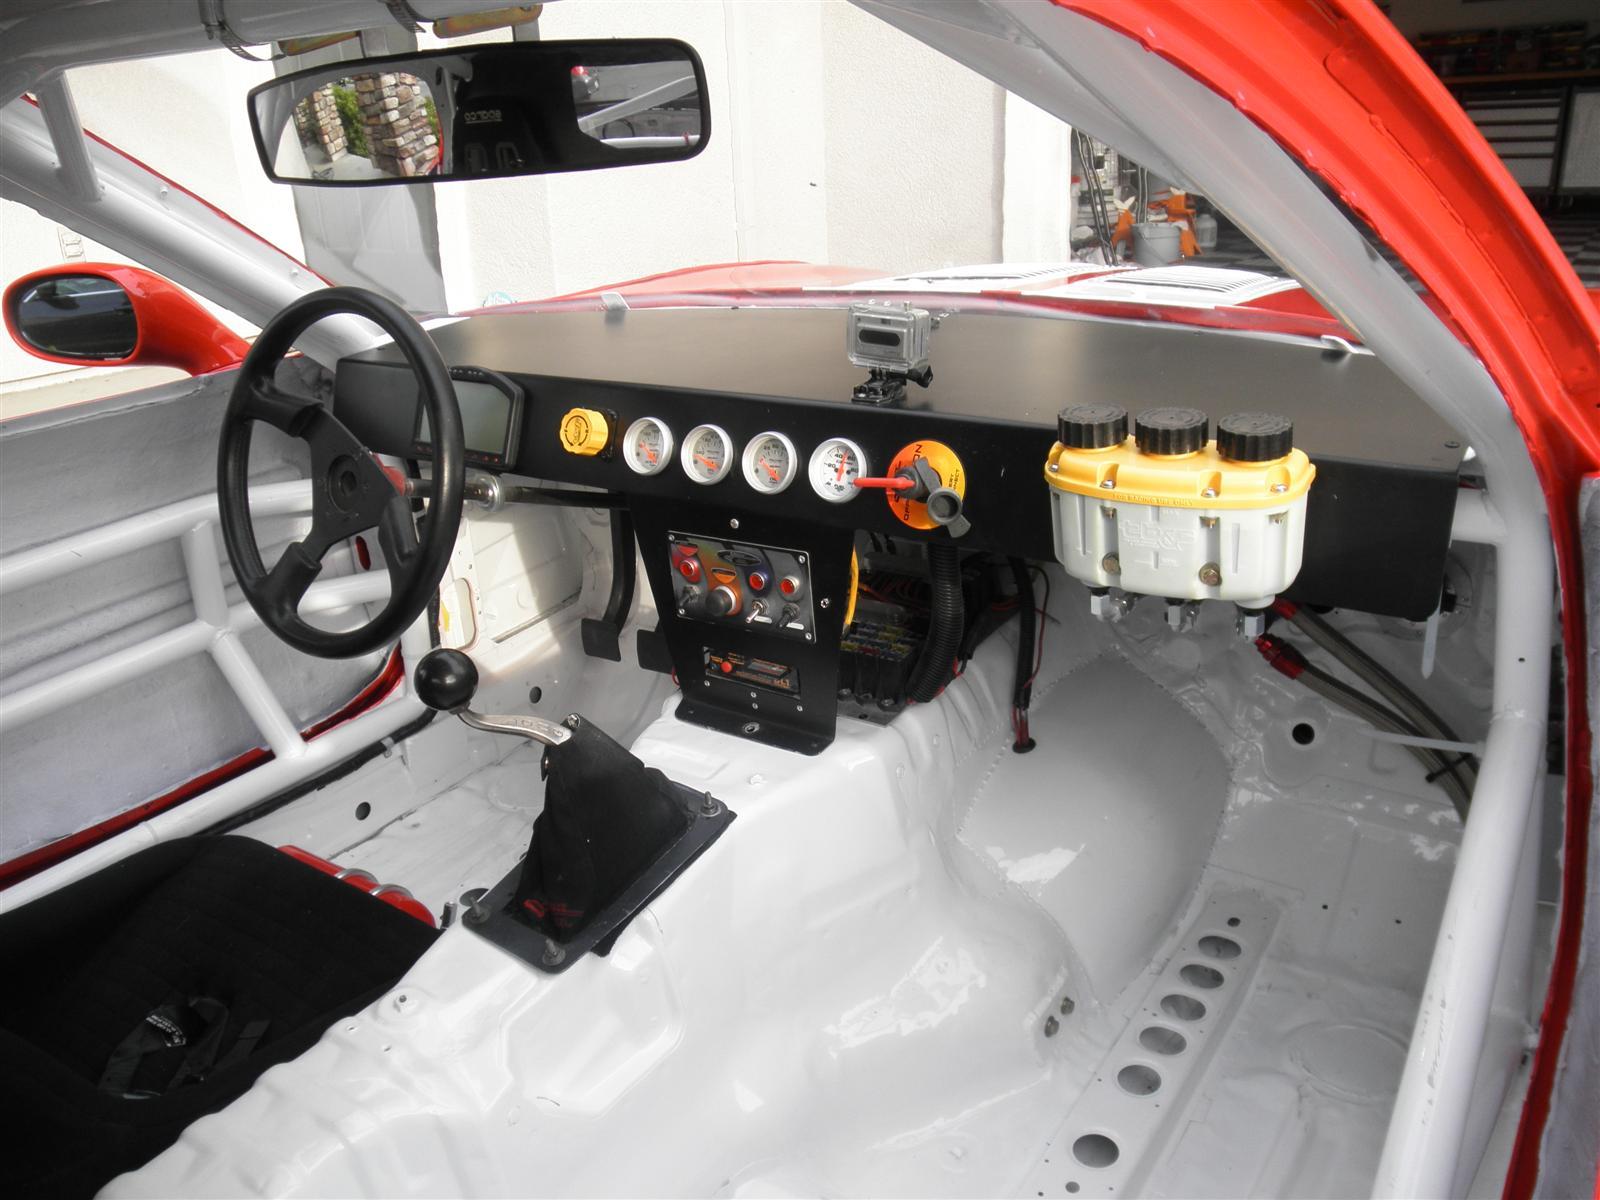 FD race car interior ideas - RX7Club.com - Mazda RX7 Forum